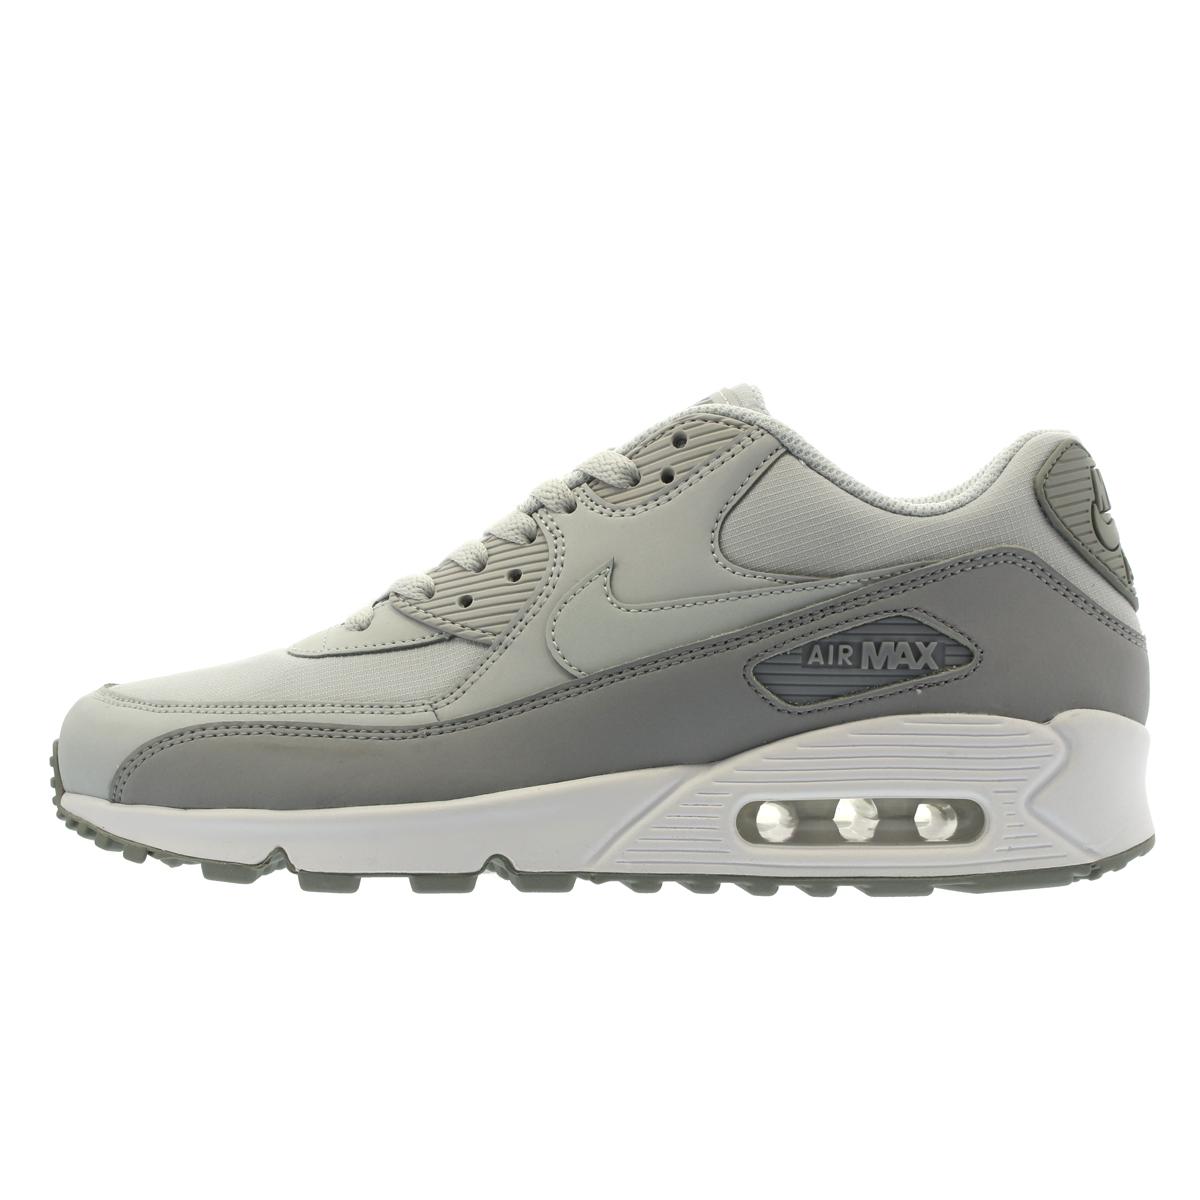 sports shoes f3d2c a48b8 NIKE AIR MAX 90 ESSENTIAL MEN WOLF GREY  PURE PLATINUM 537384 088